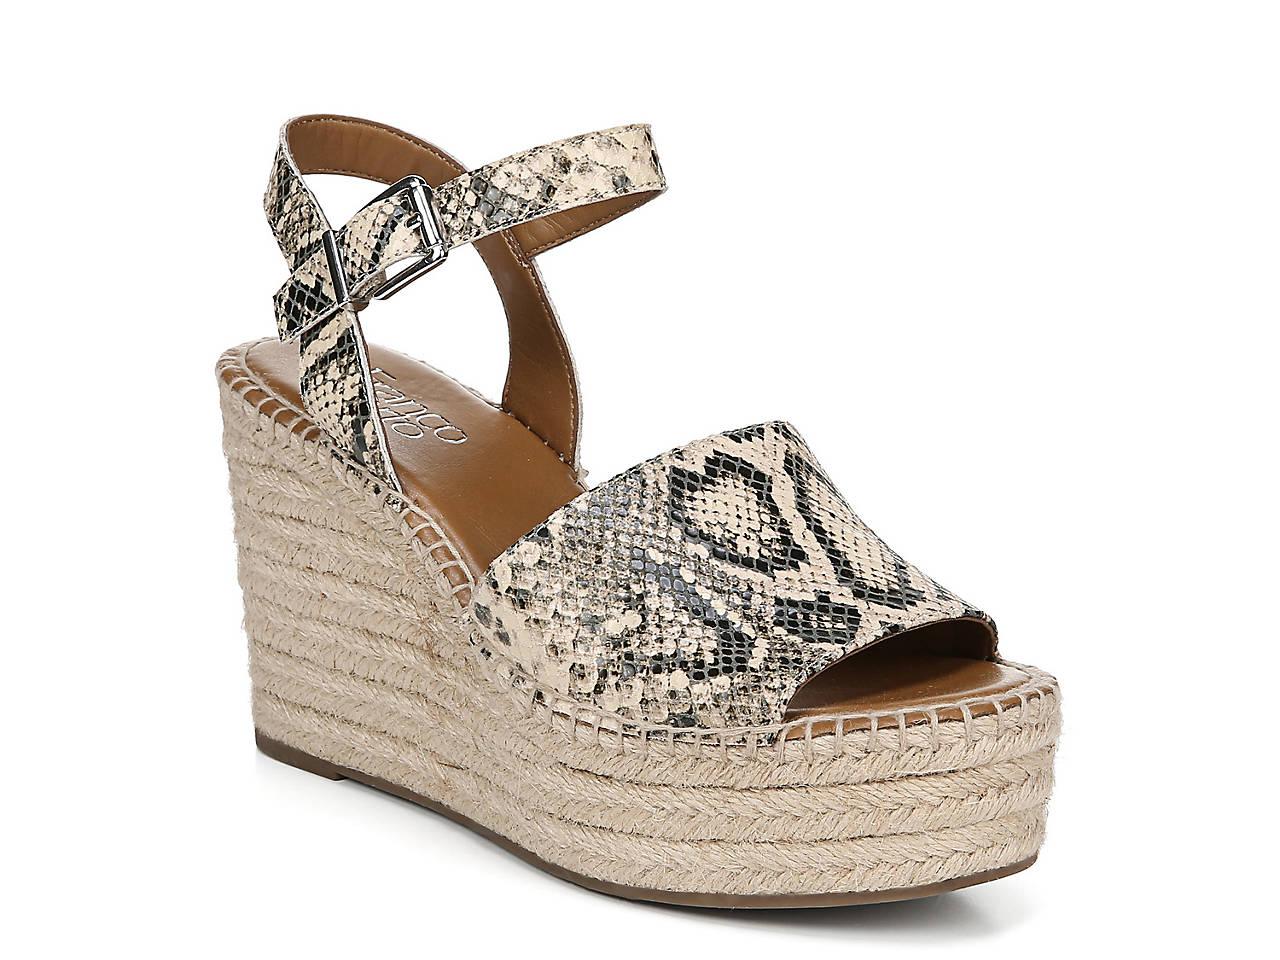 5add4489ac3 Franco Sarto Takara Espadrille Wedge Sandal Women s Shoes